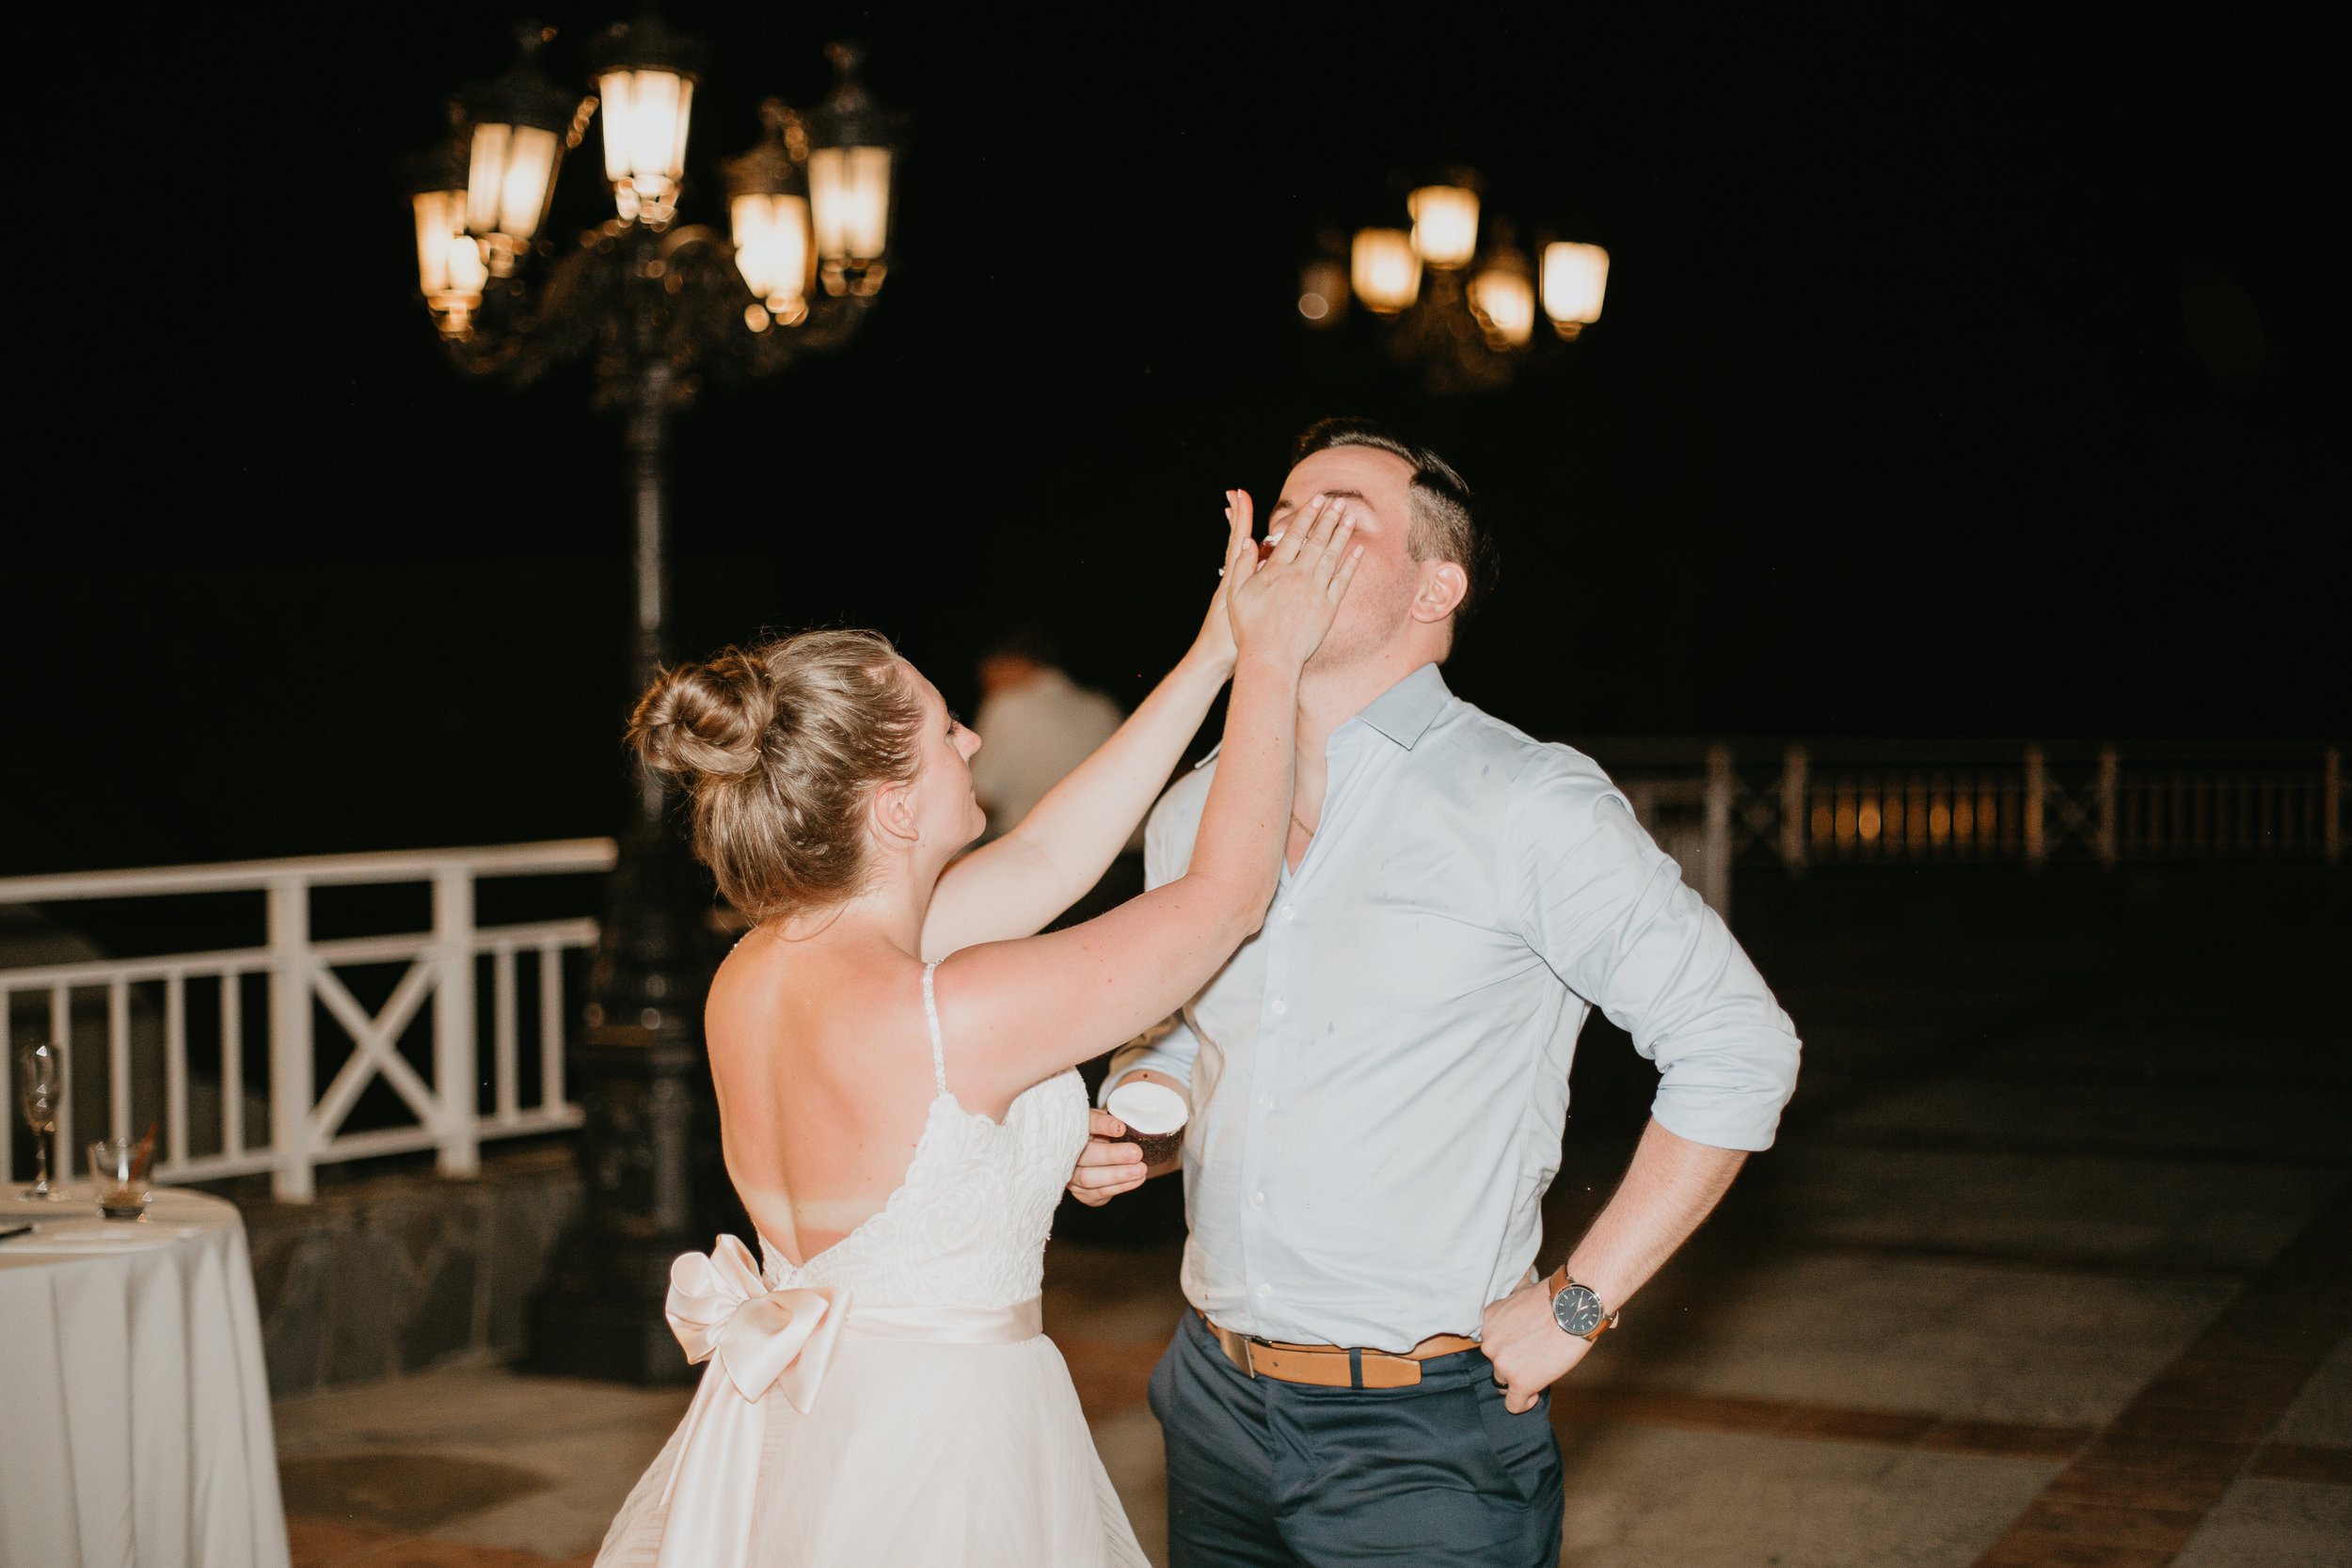 nicole-daacke-photography-destination-wedding-in-st-lucia-sandals-la-toc-intimate-island-wedding-carribean-elopement-photographer-chill-island-wedding-181.jpg